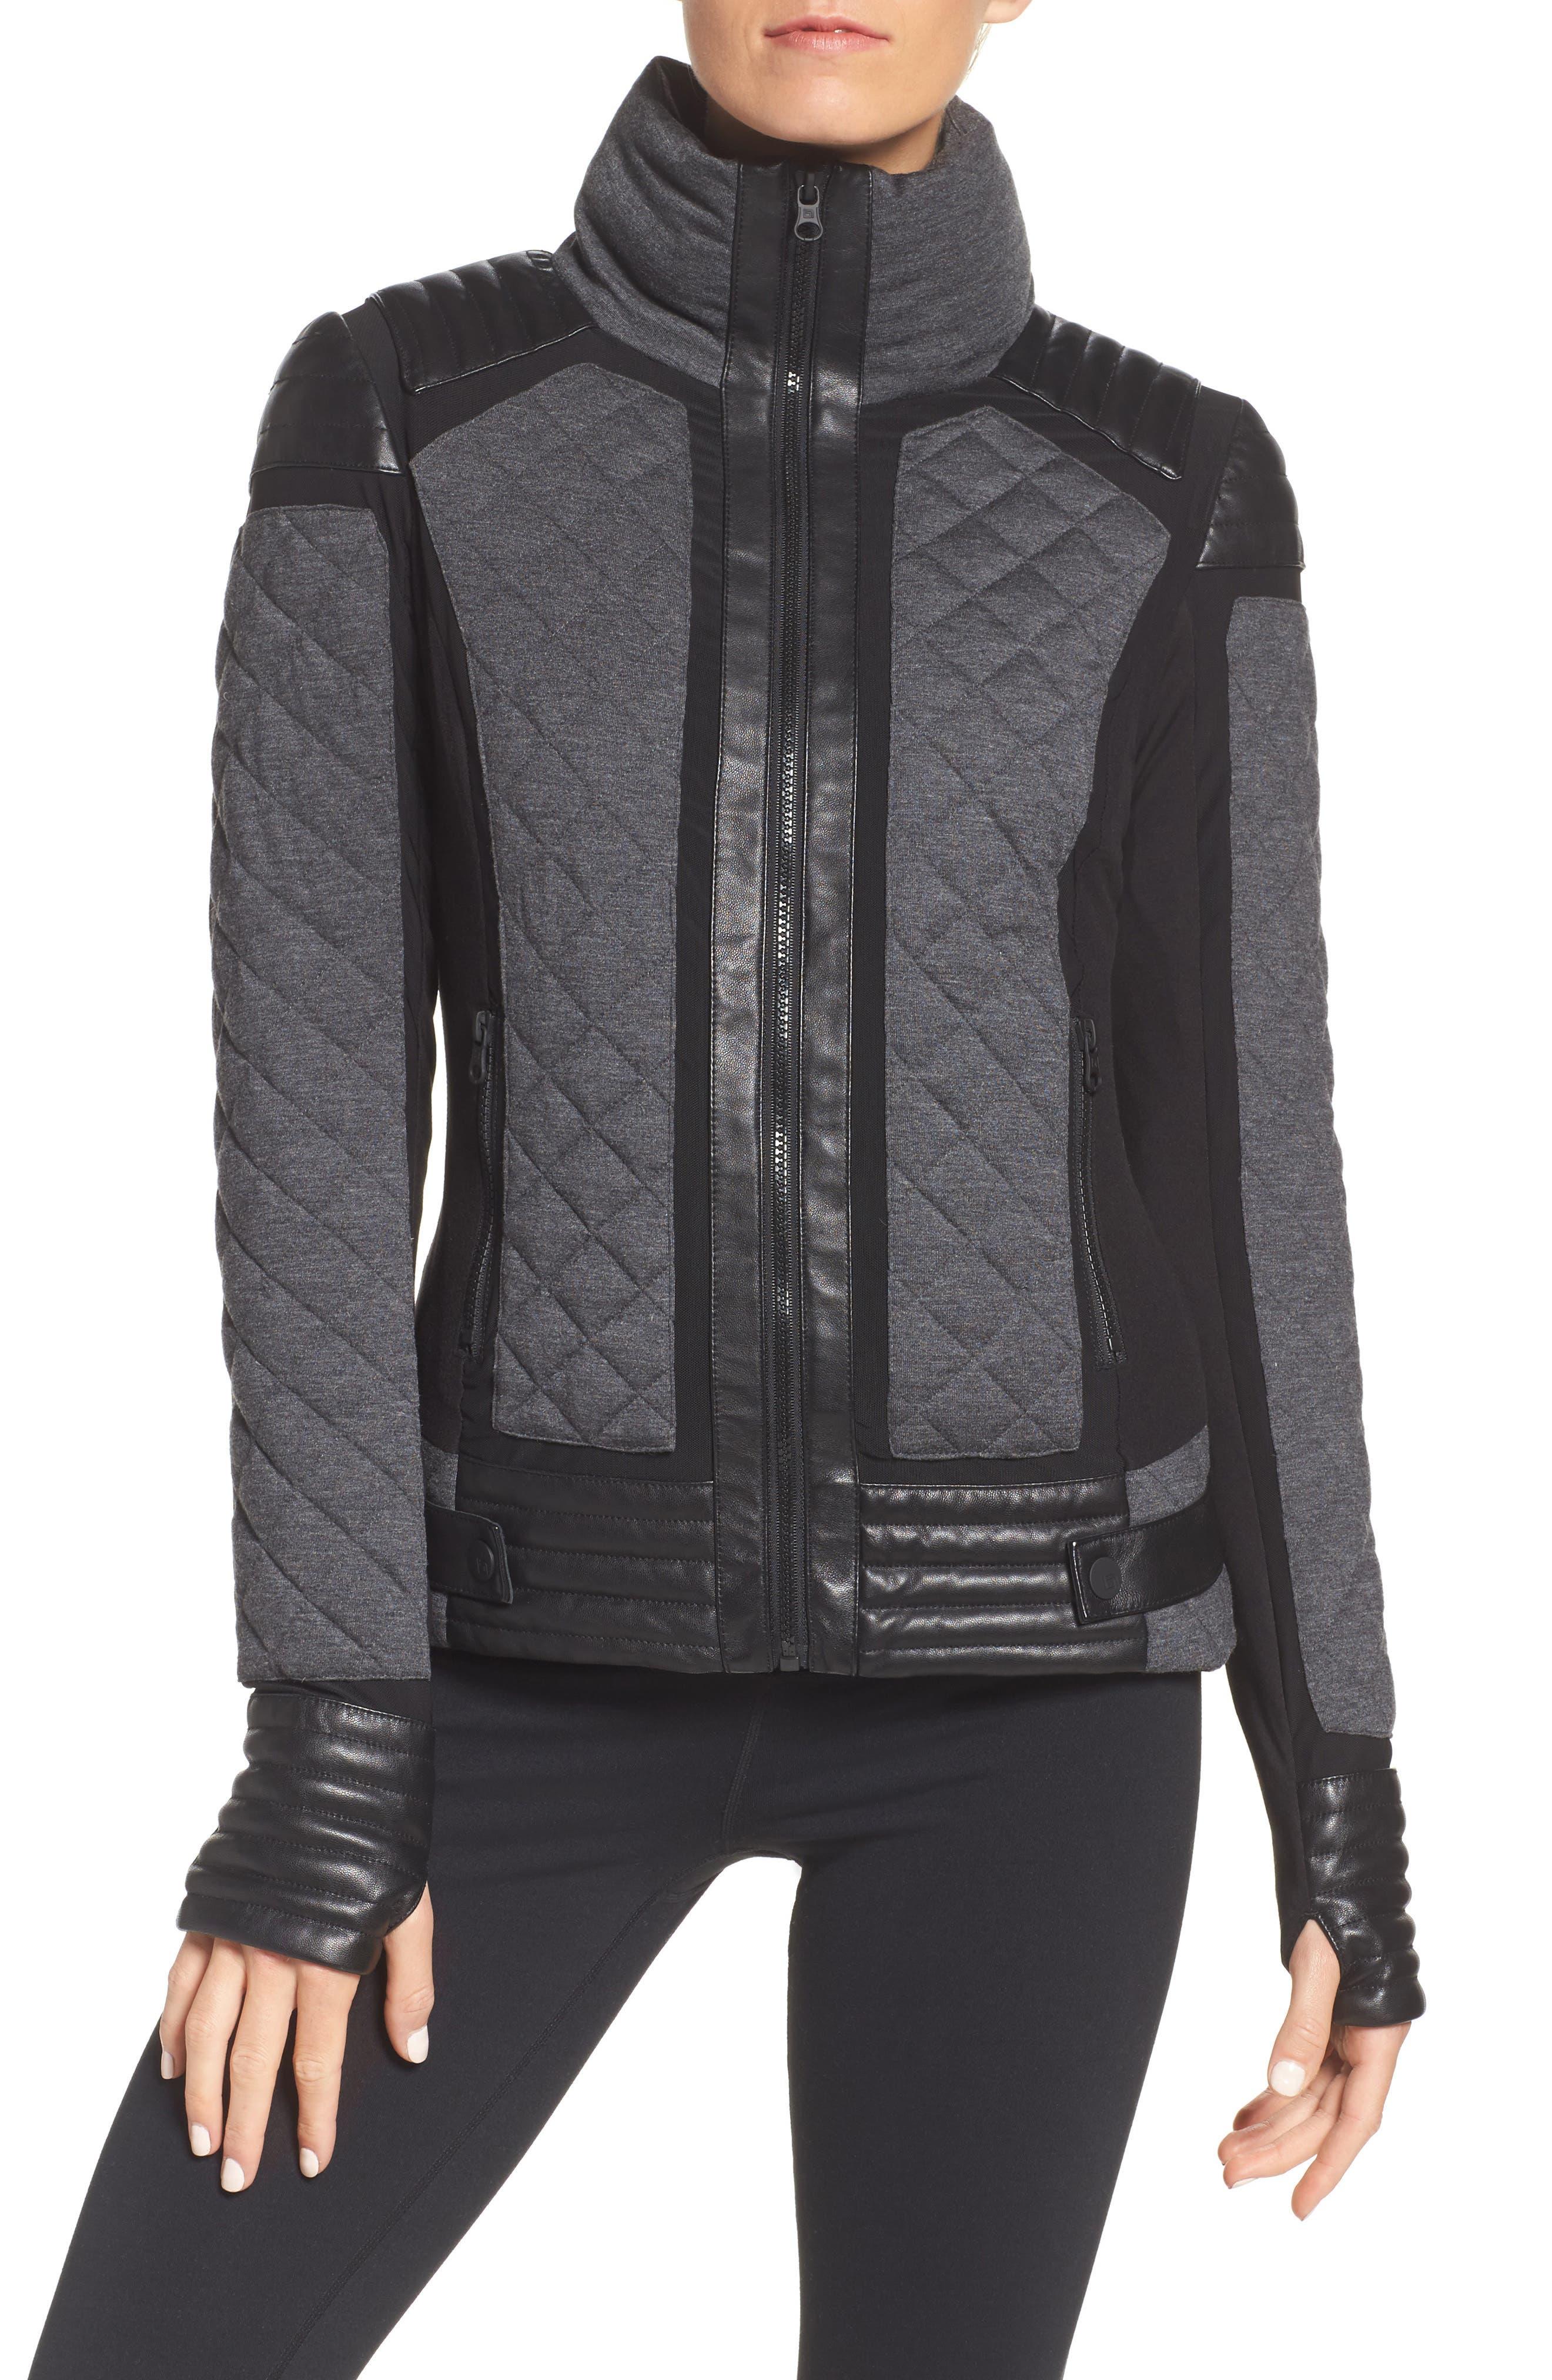 Blanc Noir Mesh Inset Moto Jacket